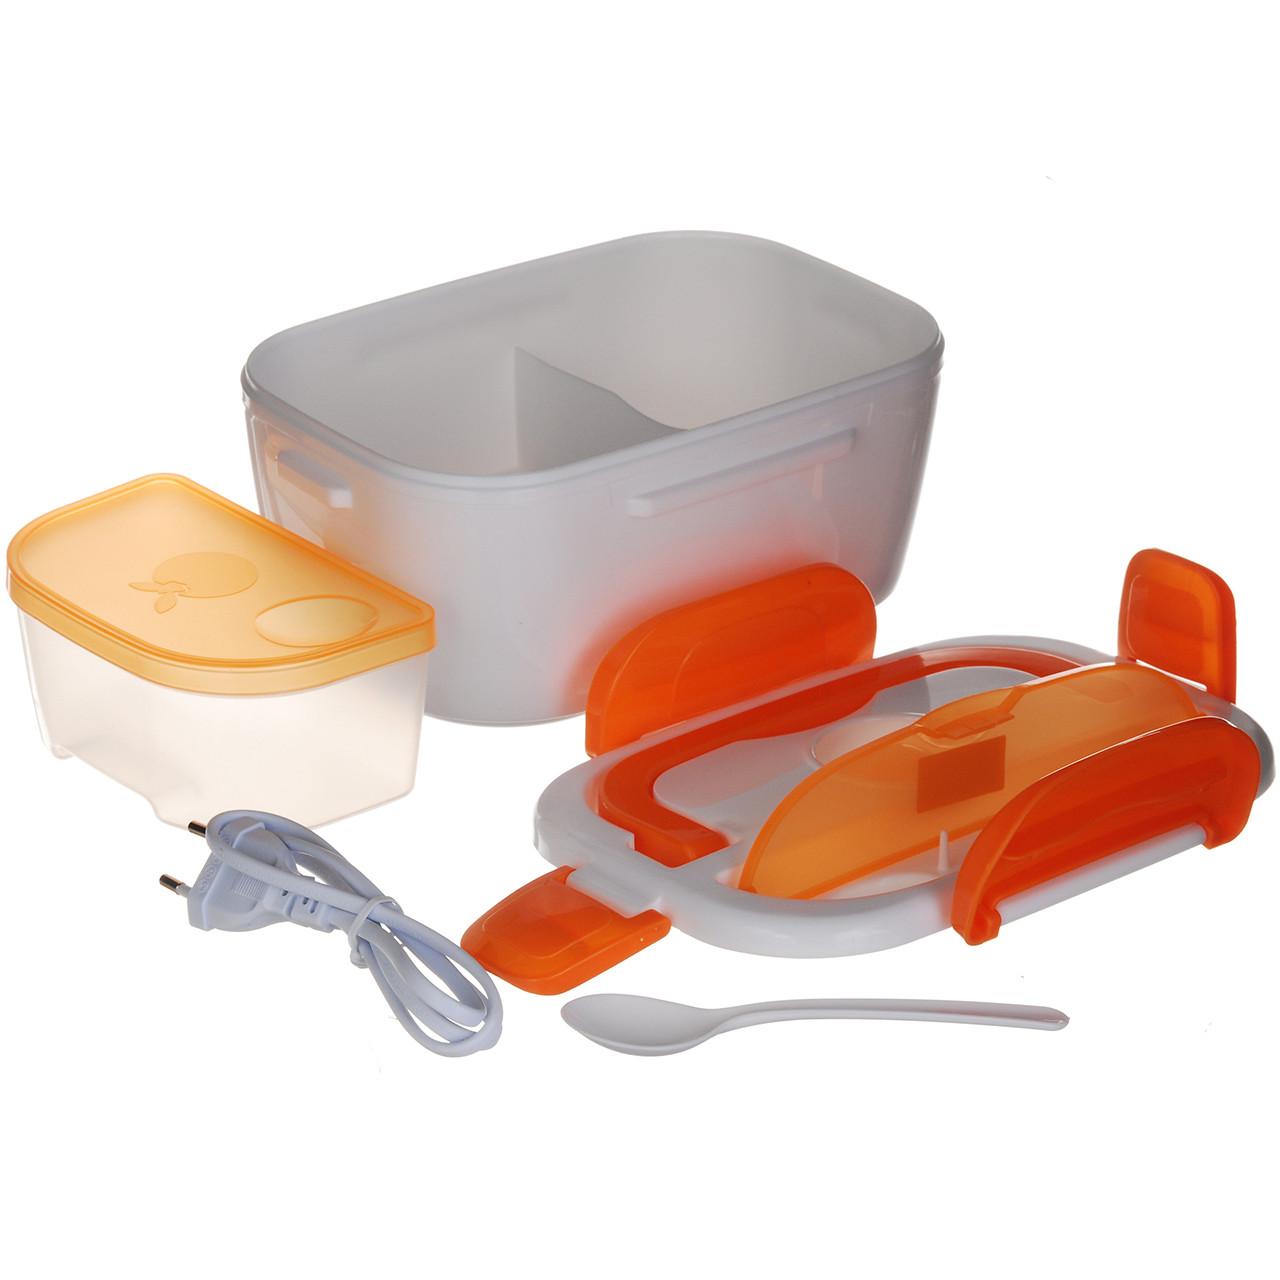 Термо ланч-бокс The Electric Lunch Box (3166) Оранжевый